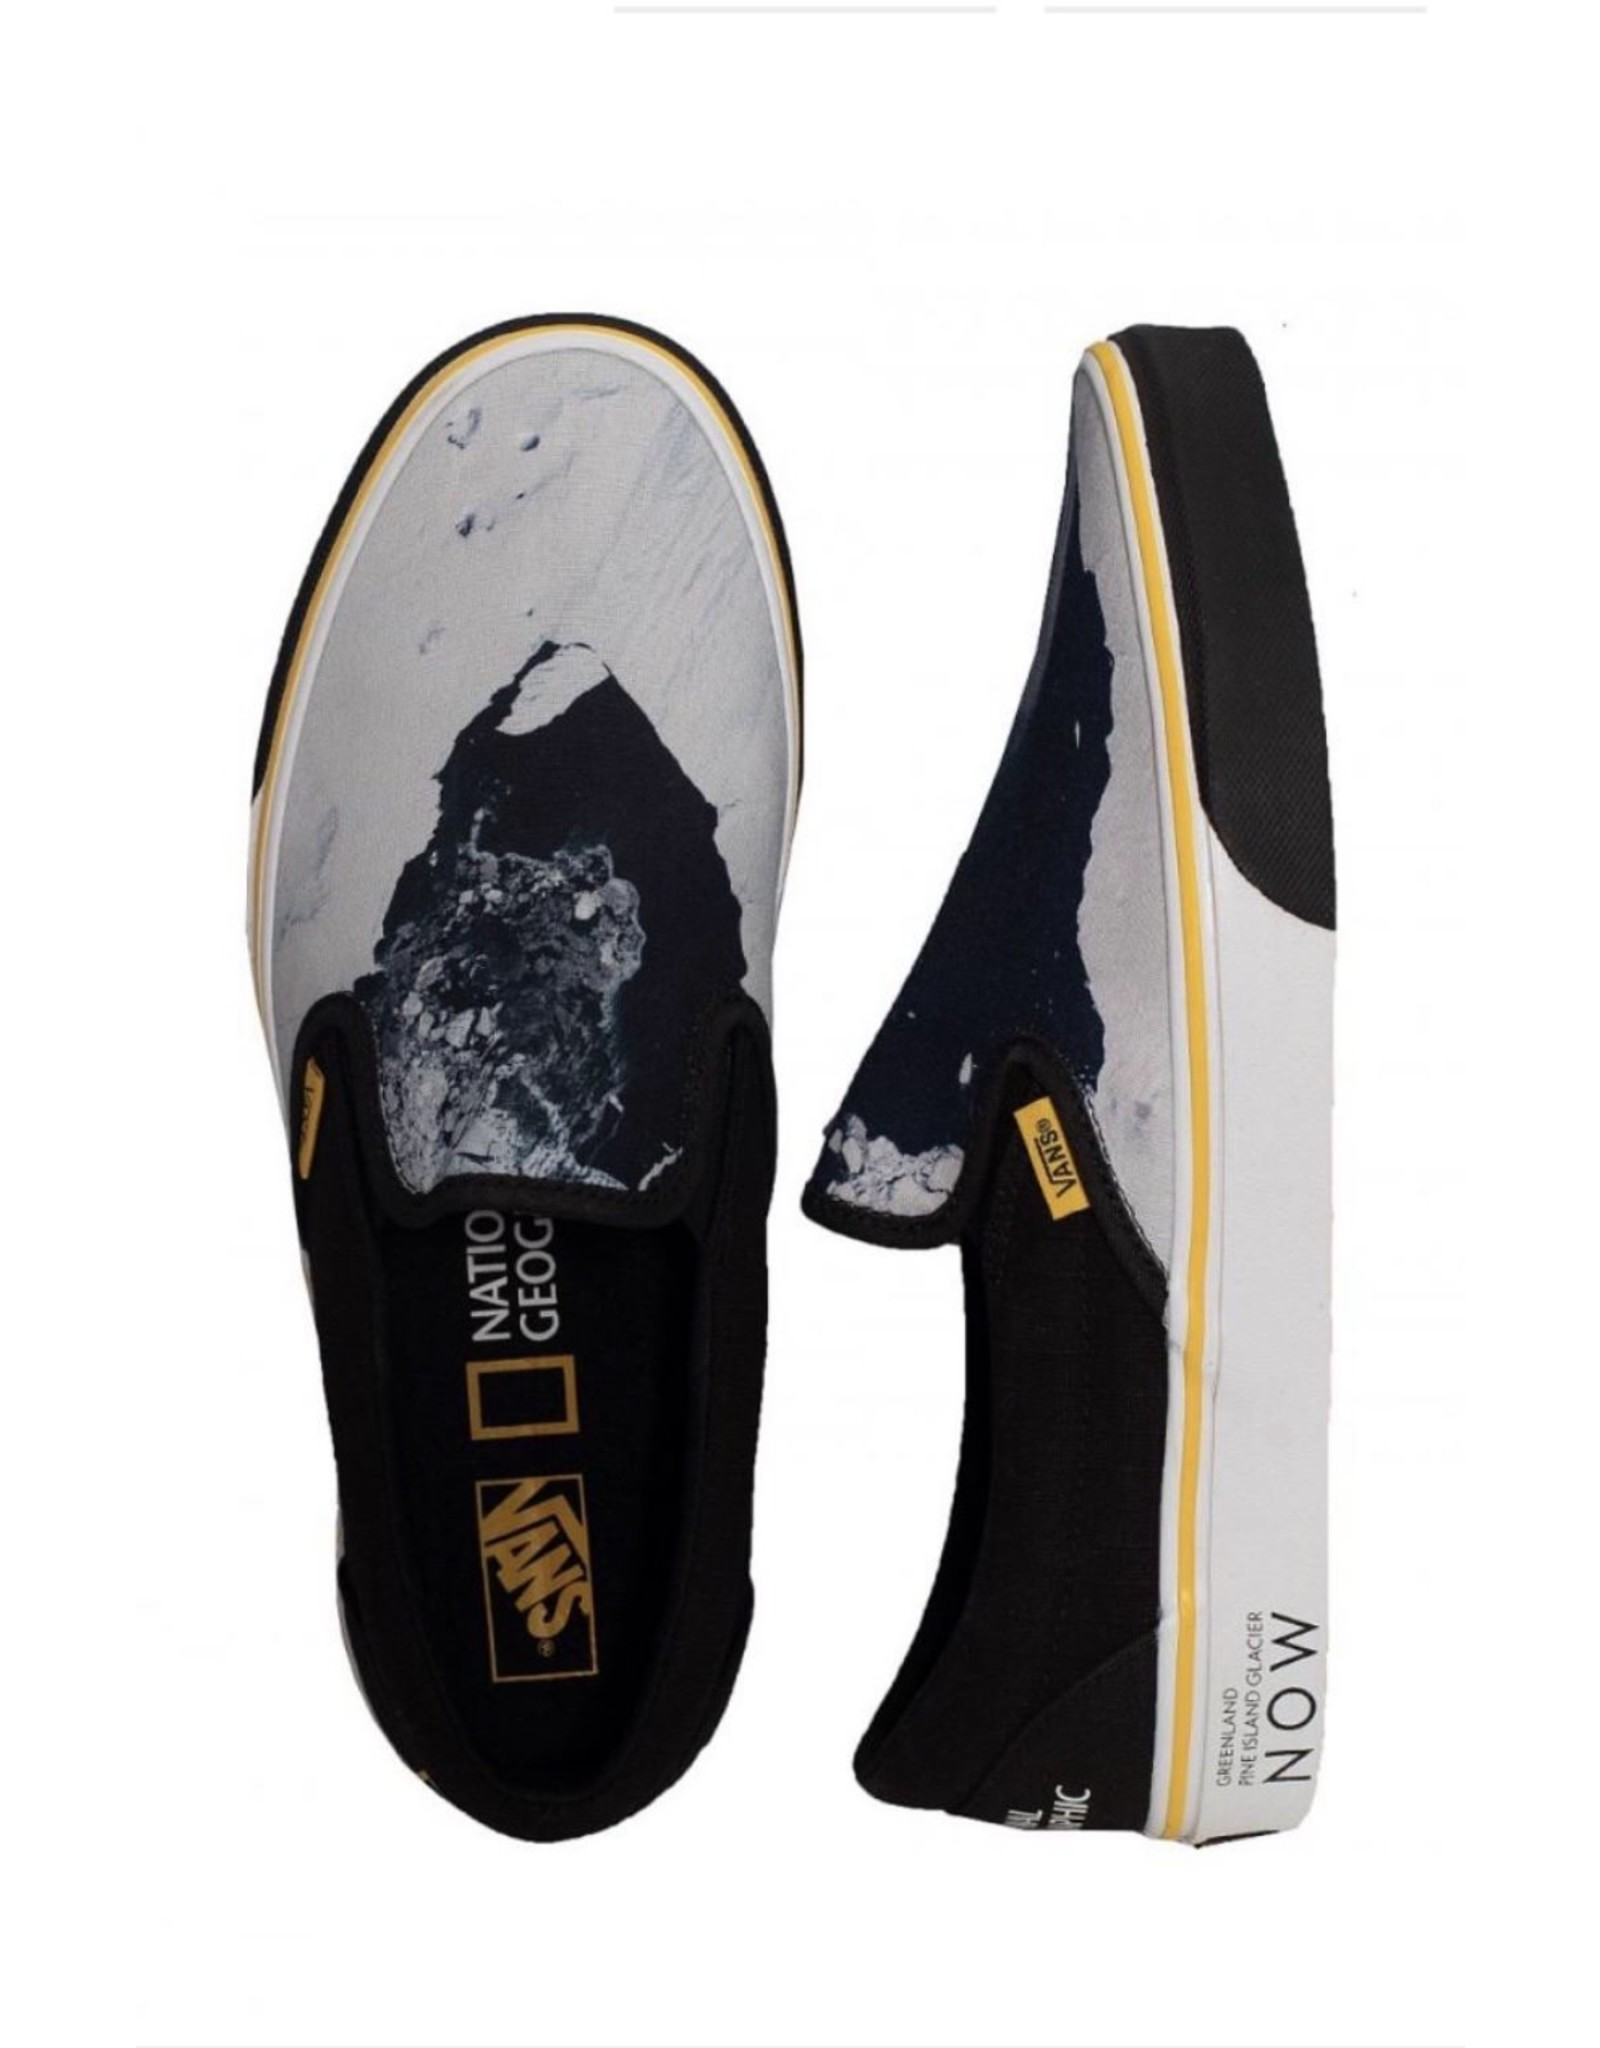 Vans National Geographic Slip On